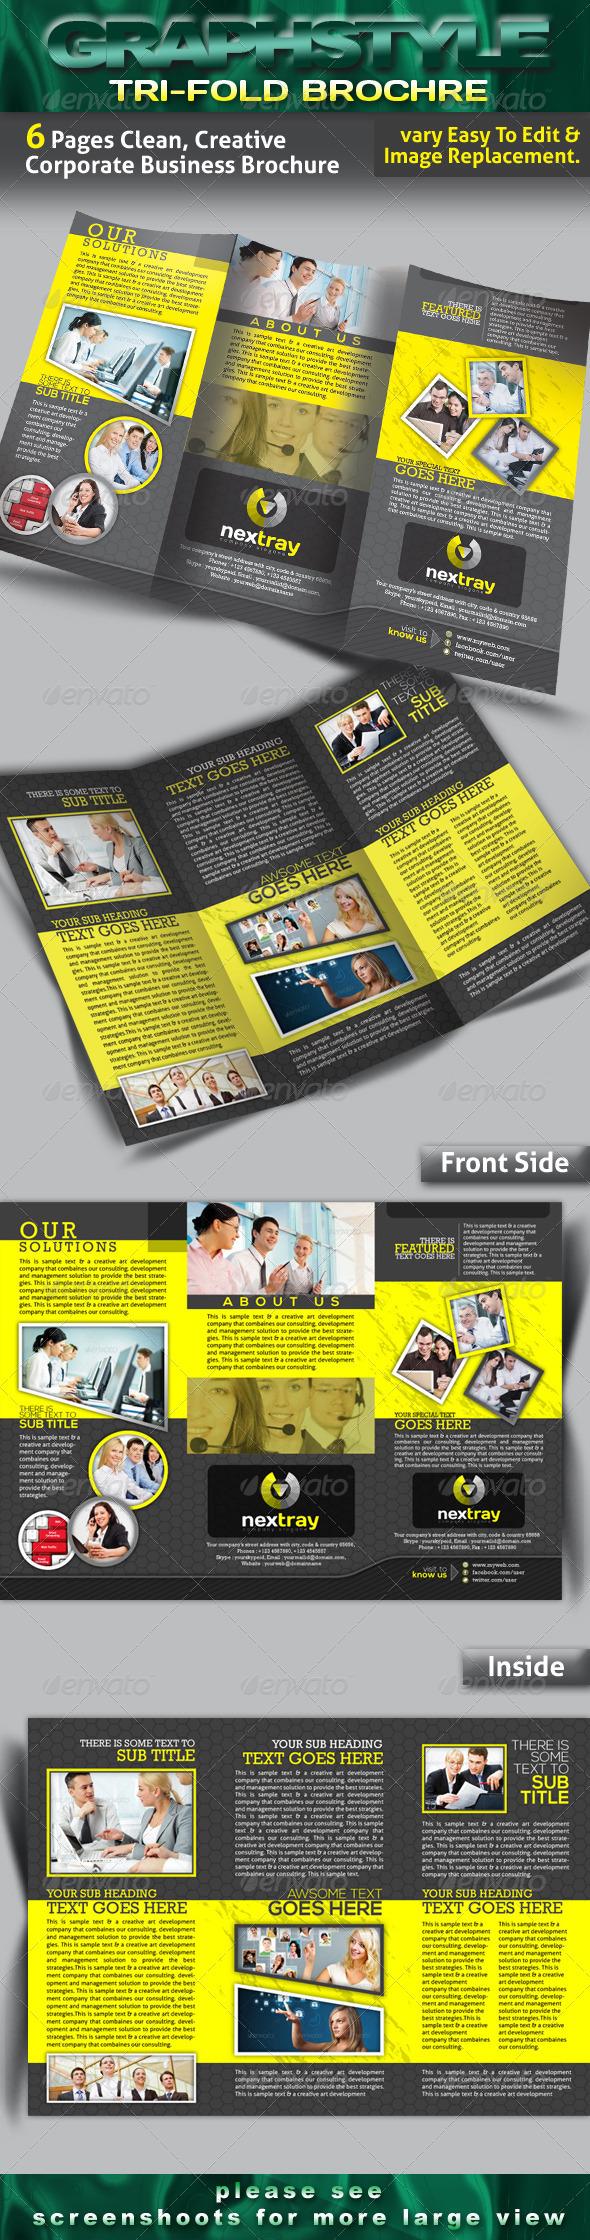 nextray Tri-fold Corporate Business Brochure - Brochures Print Templates